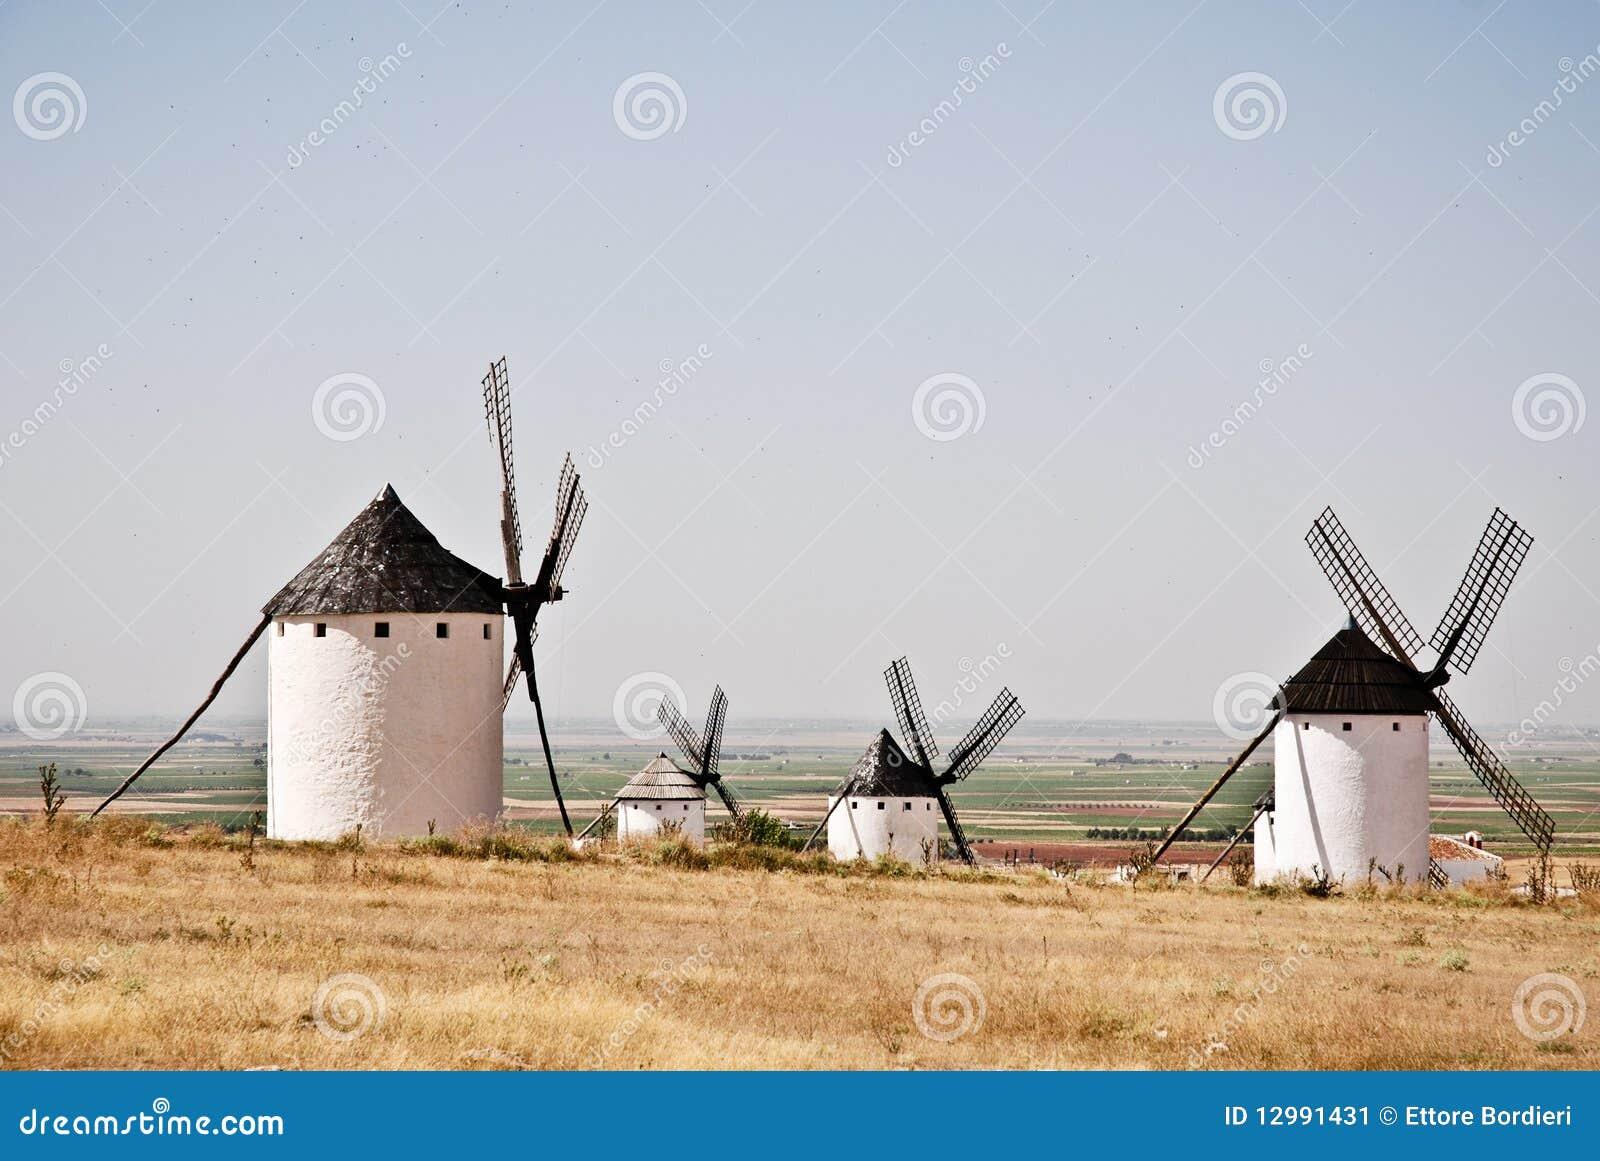 Windmils in La Mancha